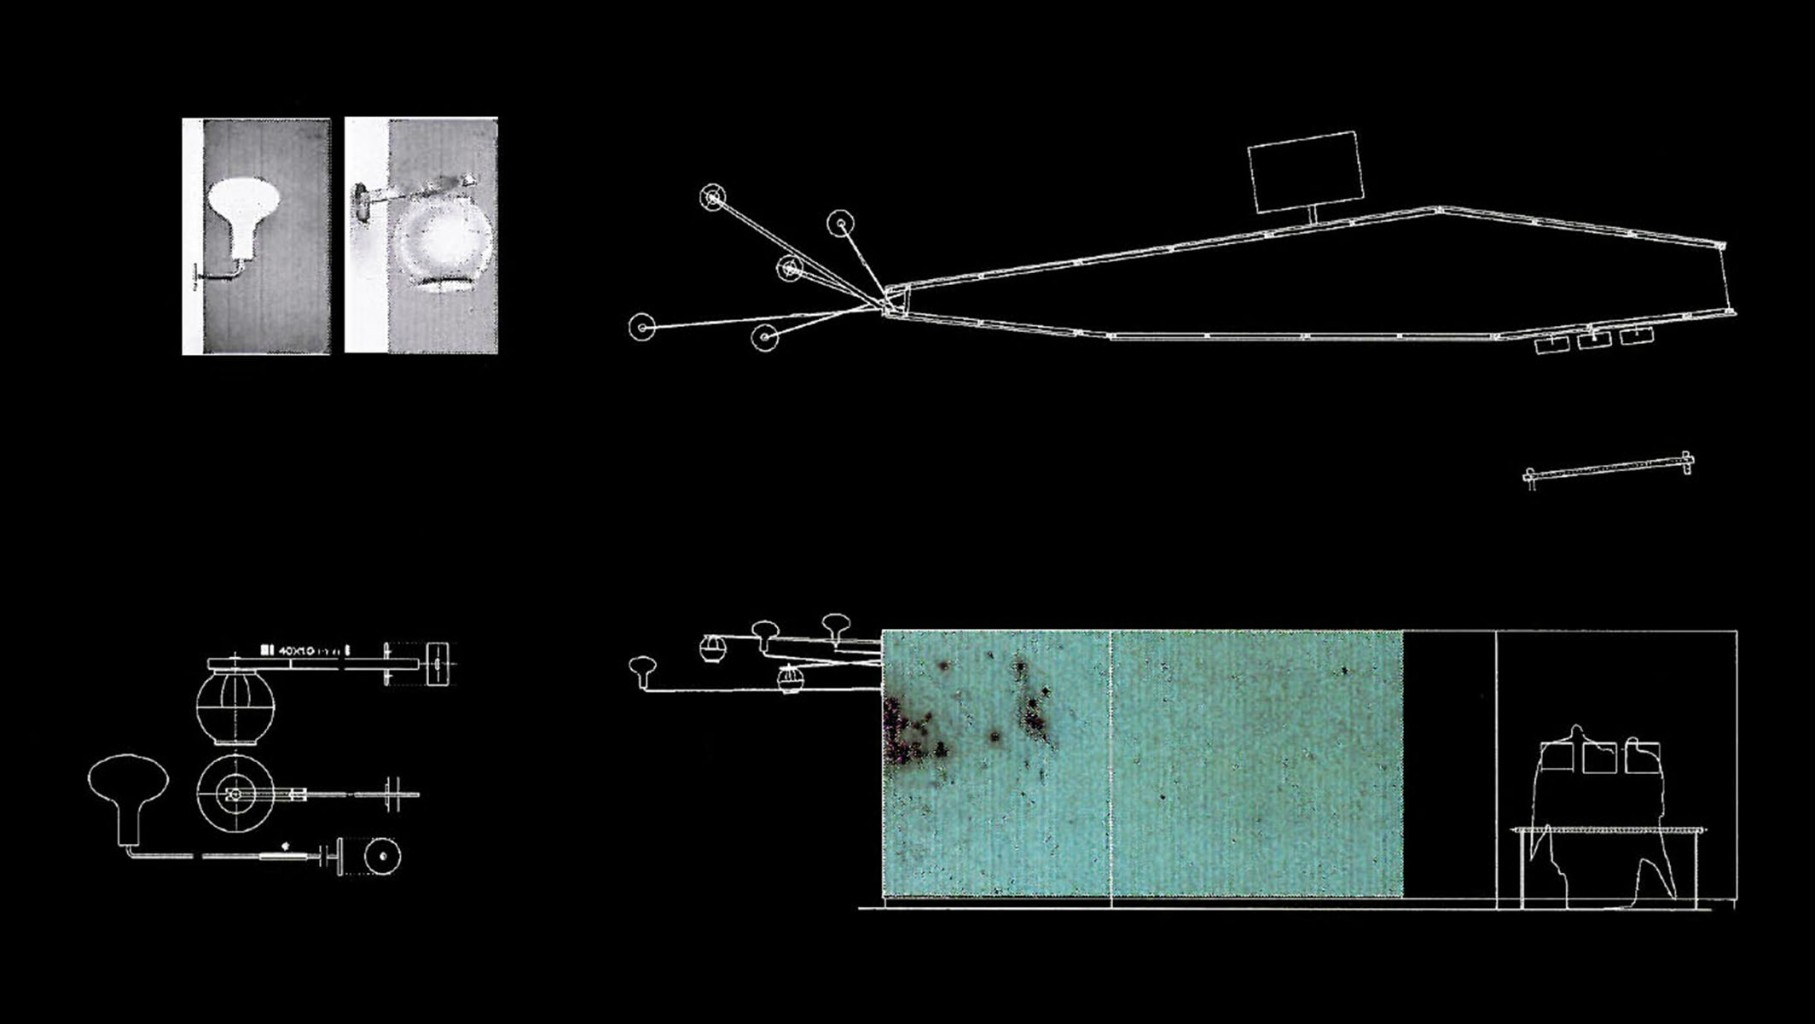 Exposición Ignazio Gardella 1905-1999, Arquitectura a través de un Siglo Blanca Lleó 01a